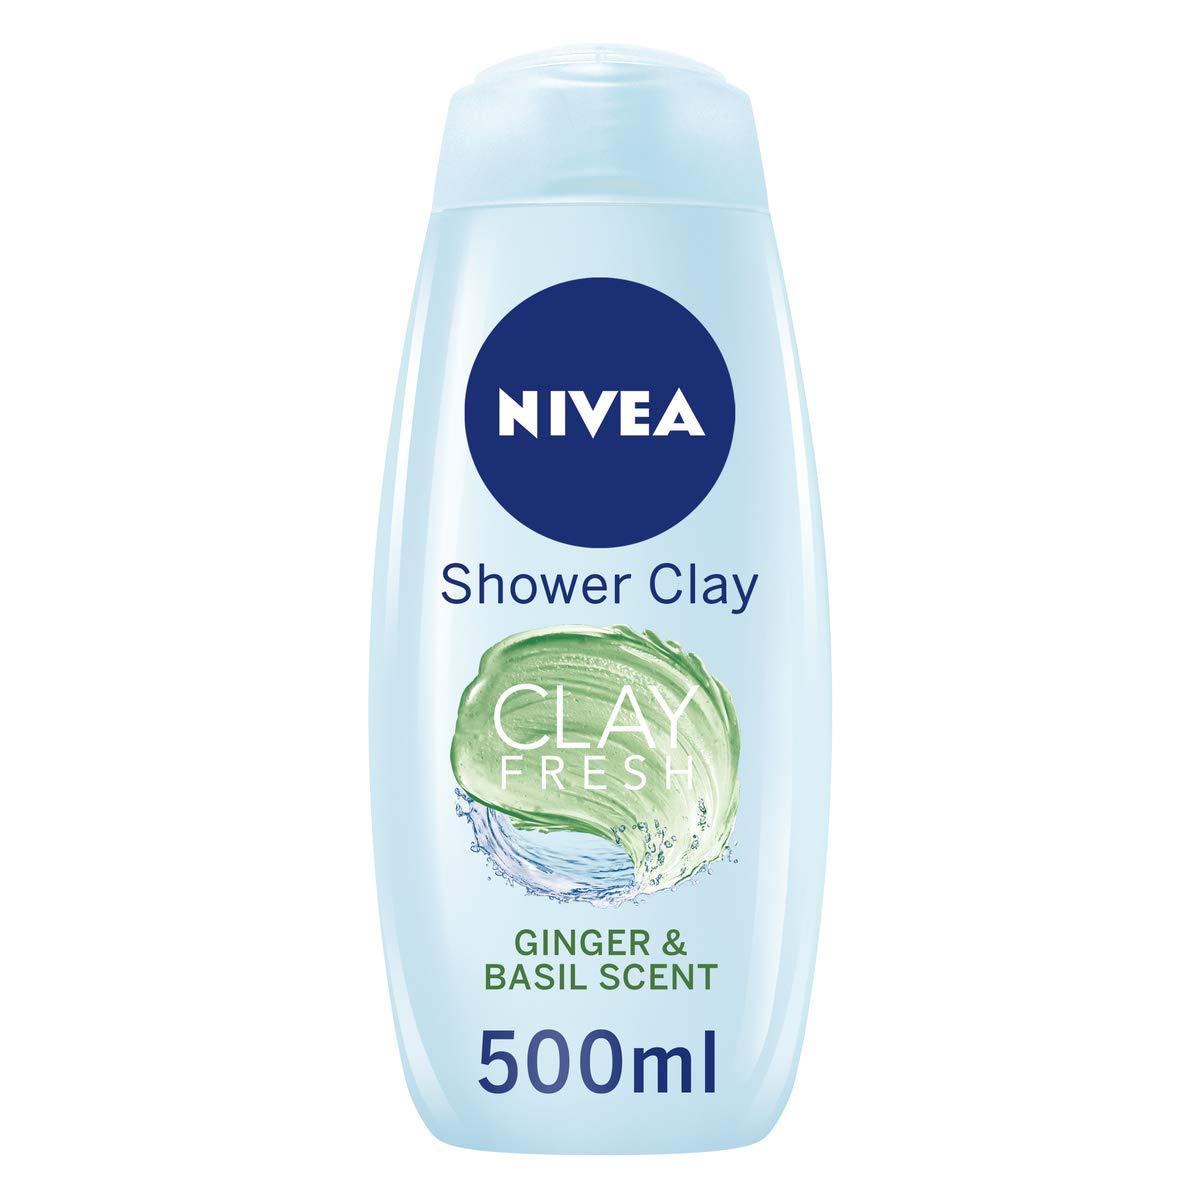 Nivea Shower Clay Fresh Ginger & Basil 500Ml (Pack of 6) £4.13 Hibiscus & White Sage £4.76 (+£4.49 non Prime) @ Amazon